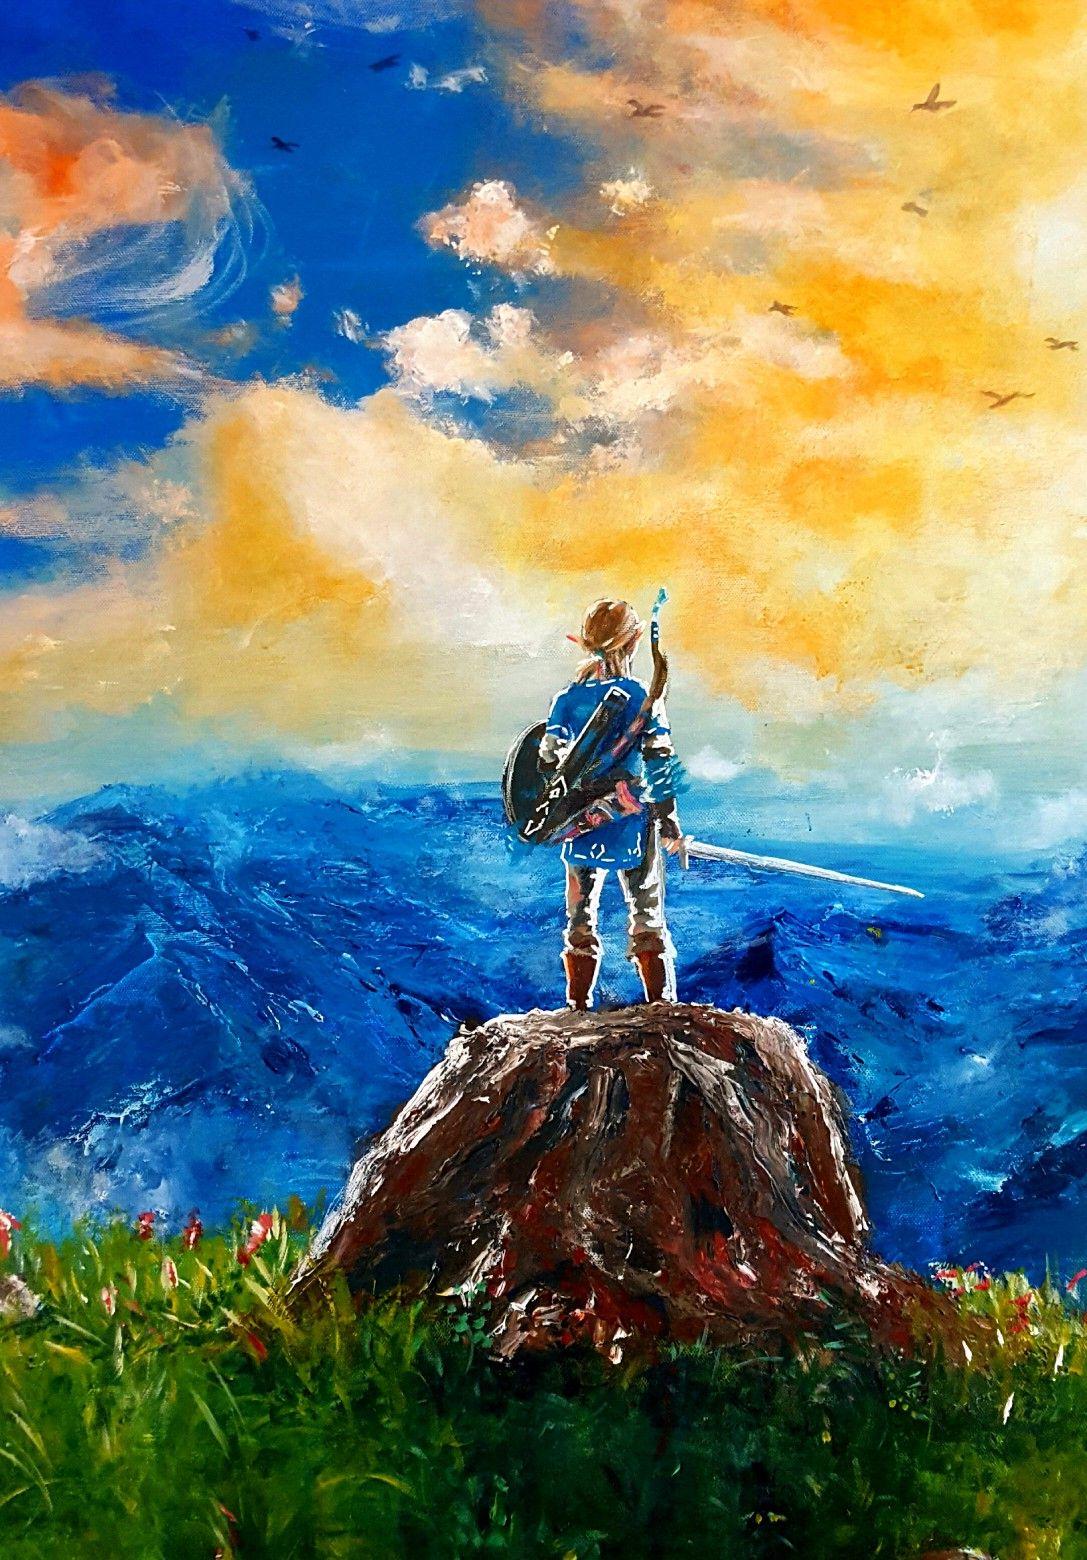 Painting Acrylic Zelda Breath Of The Wild Fanart Art Print Illustration Acrylic Painting Inspiration Painting Inspiration Painting